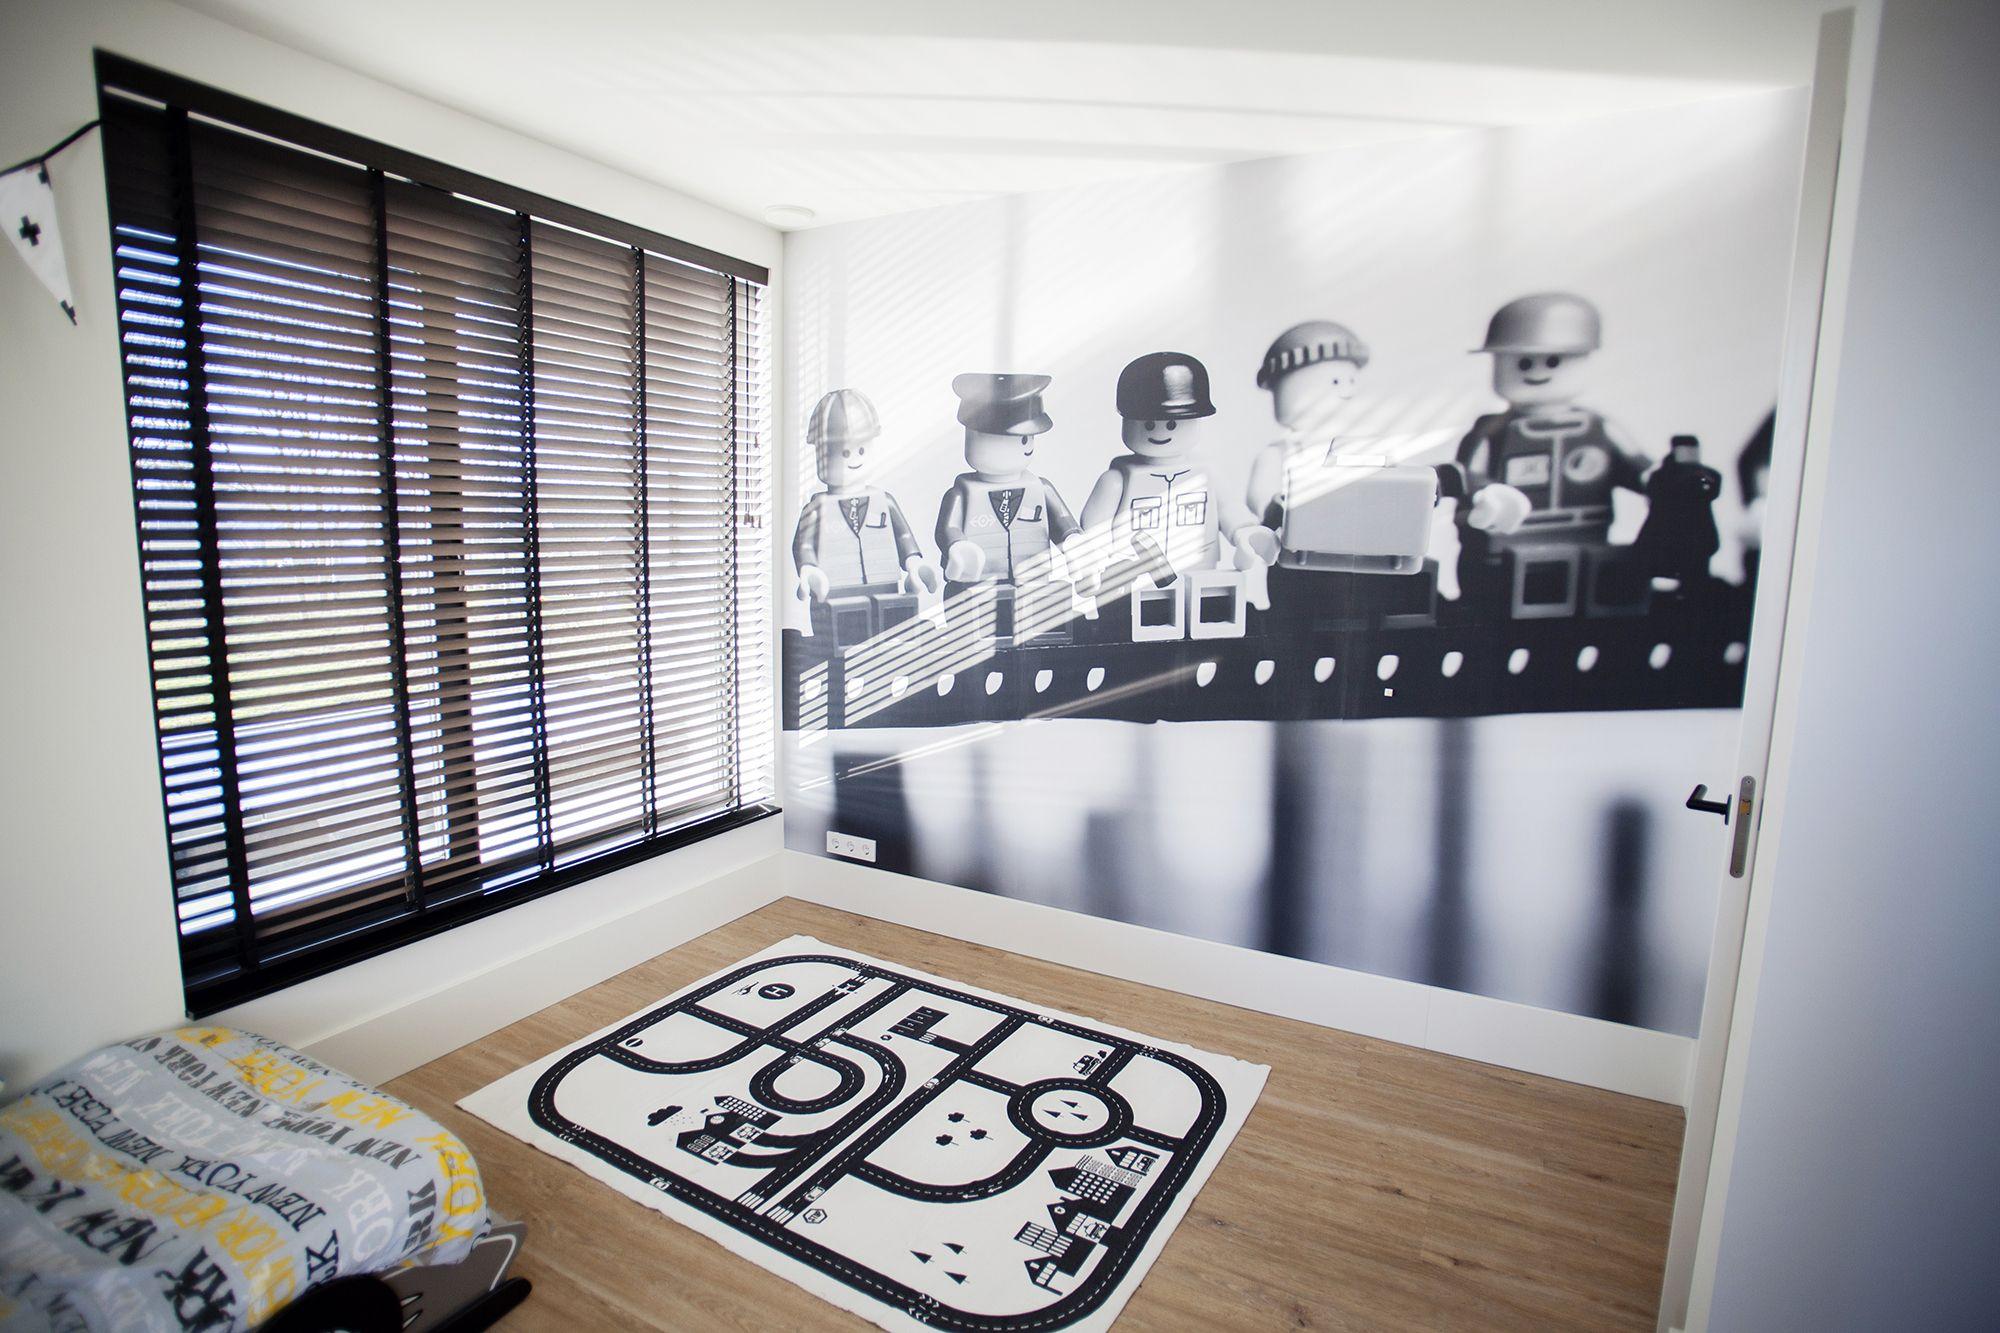 8x Minimalistische Kinderkamers : Gaaf fotobehang #lego #fotobehang #kinderkamer #panelprint.nl